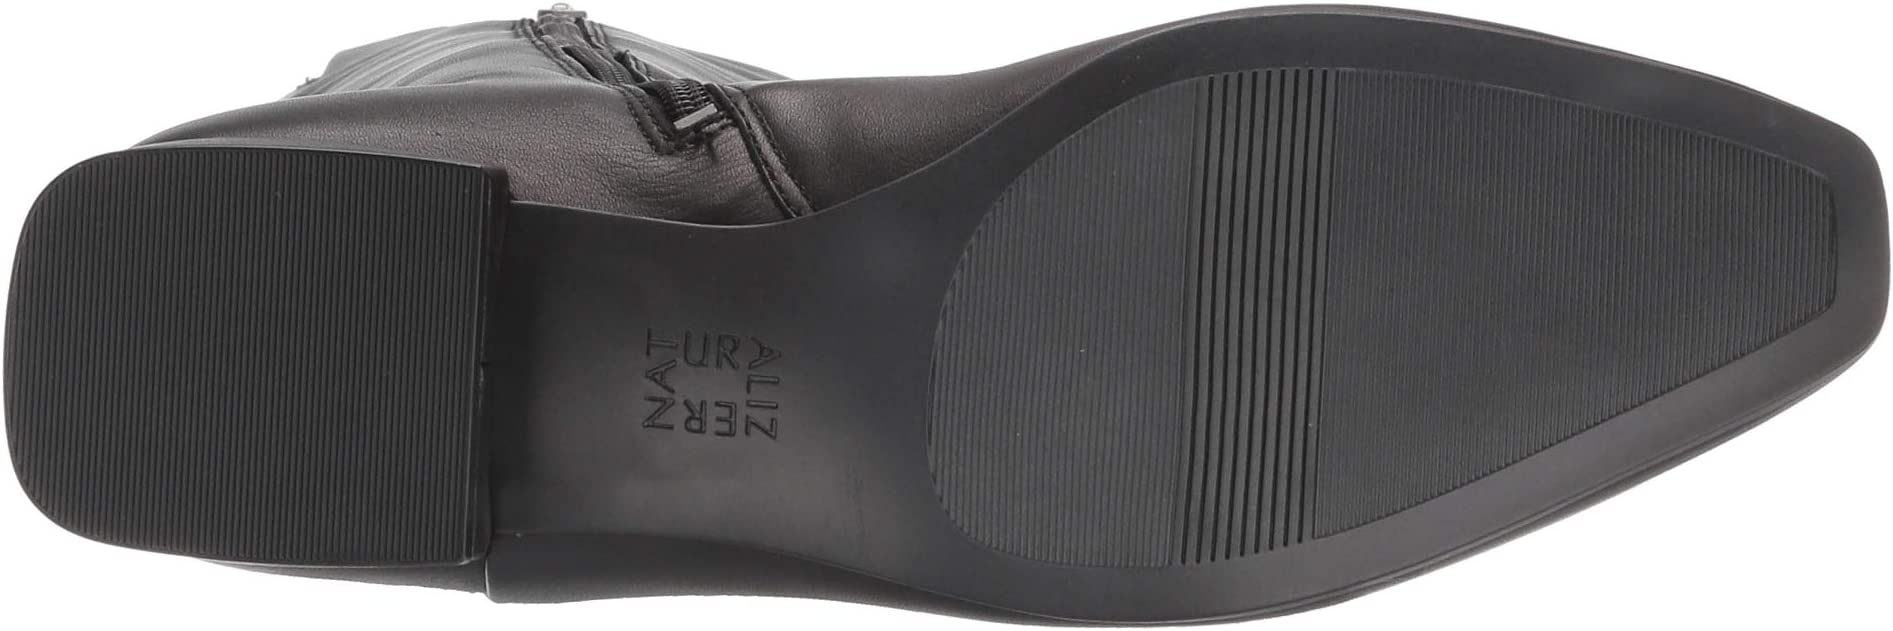 Naturalizer Carella   Women's shoes   2020 Newest